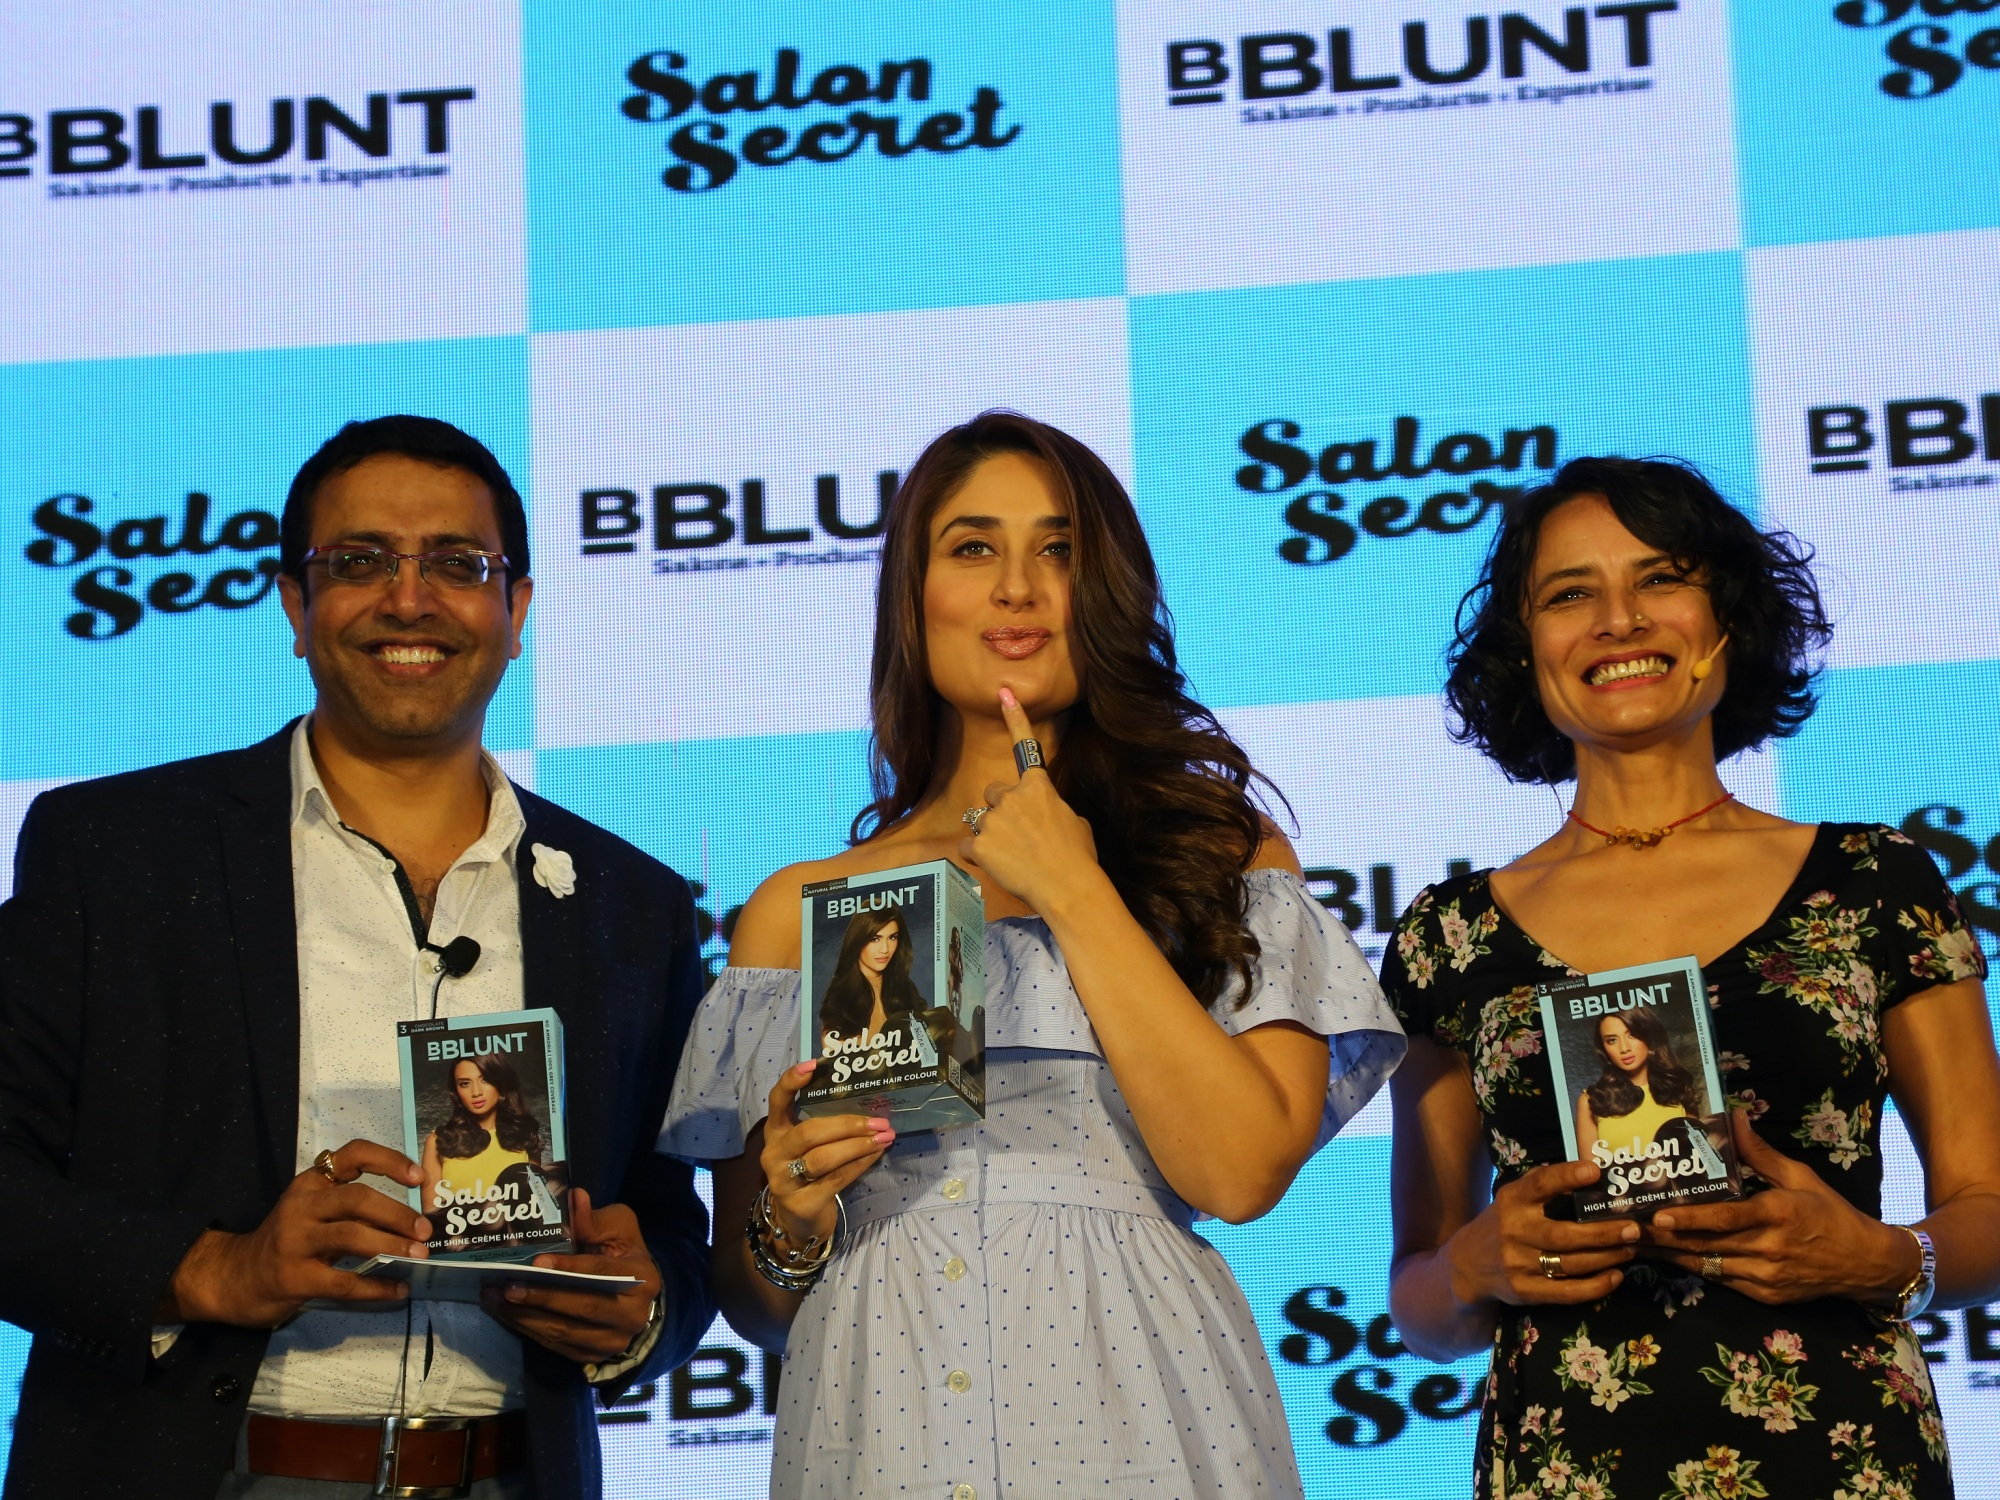 Kareena kapoor khan unveiled bblunt s new high shine cr me for B blunt salon secret hair colour price